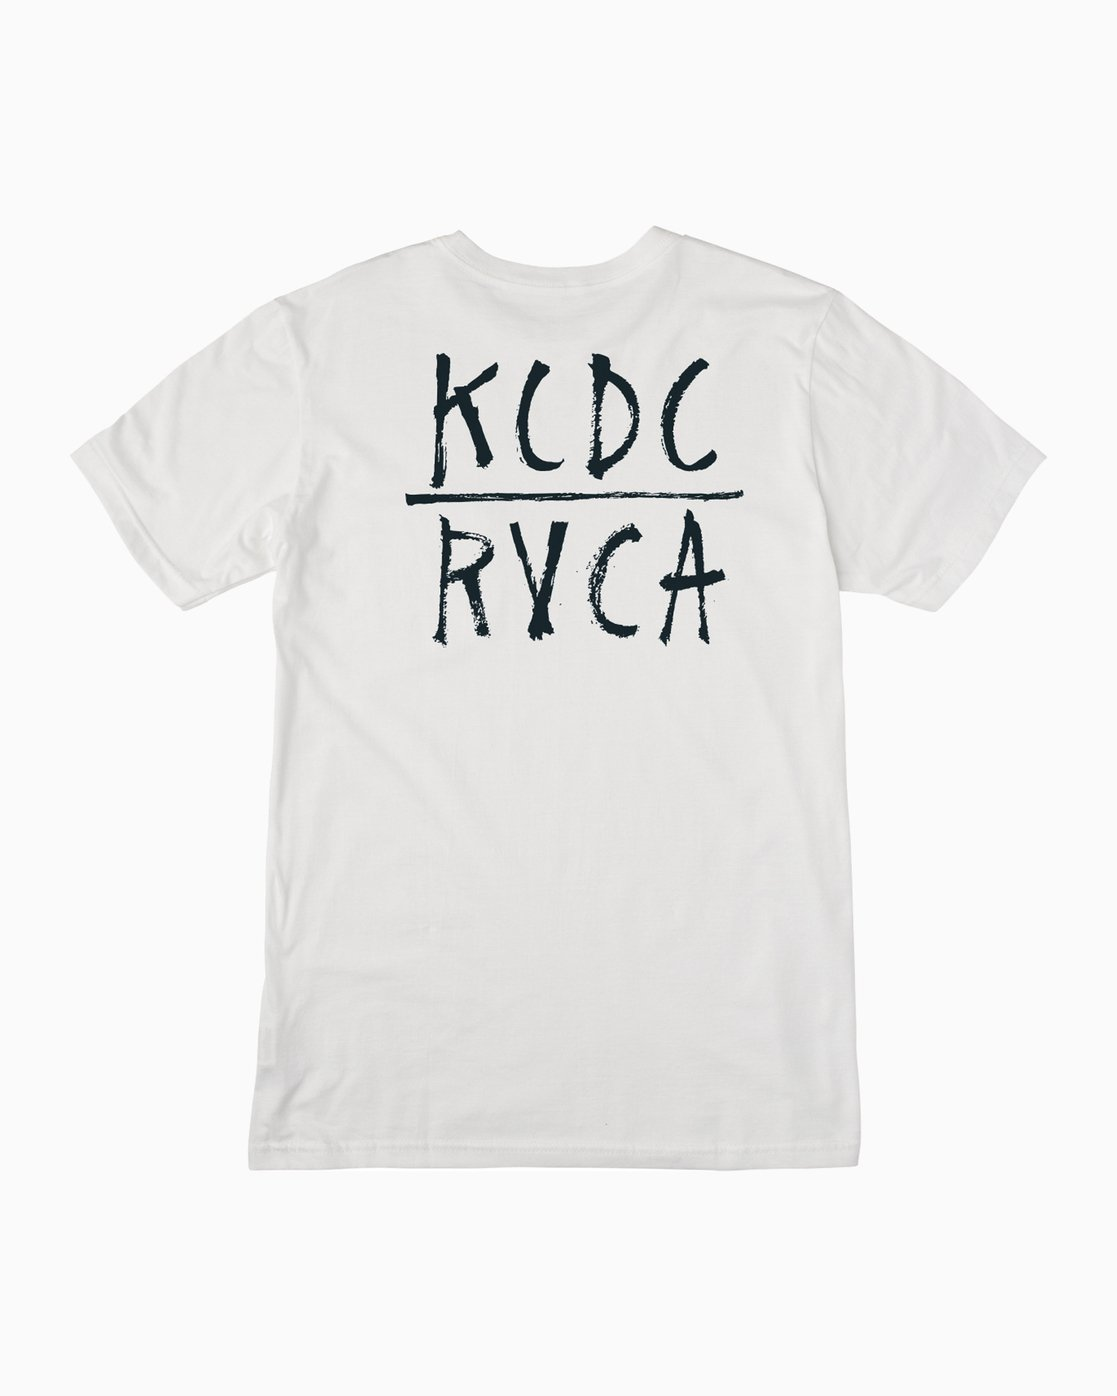 0 Ben Horton Stack KCDC Pocket T-Shirt  M439NRSM RVCA